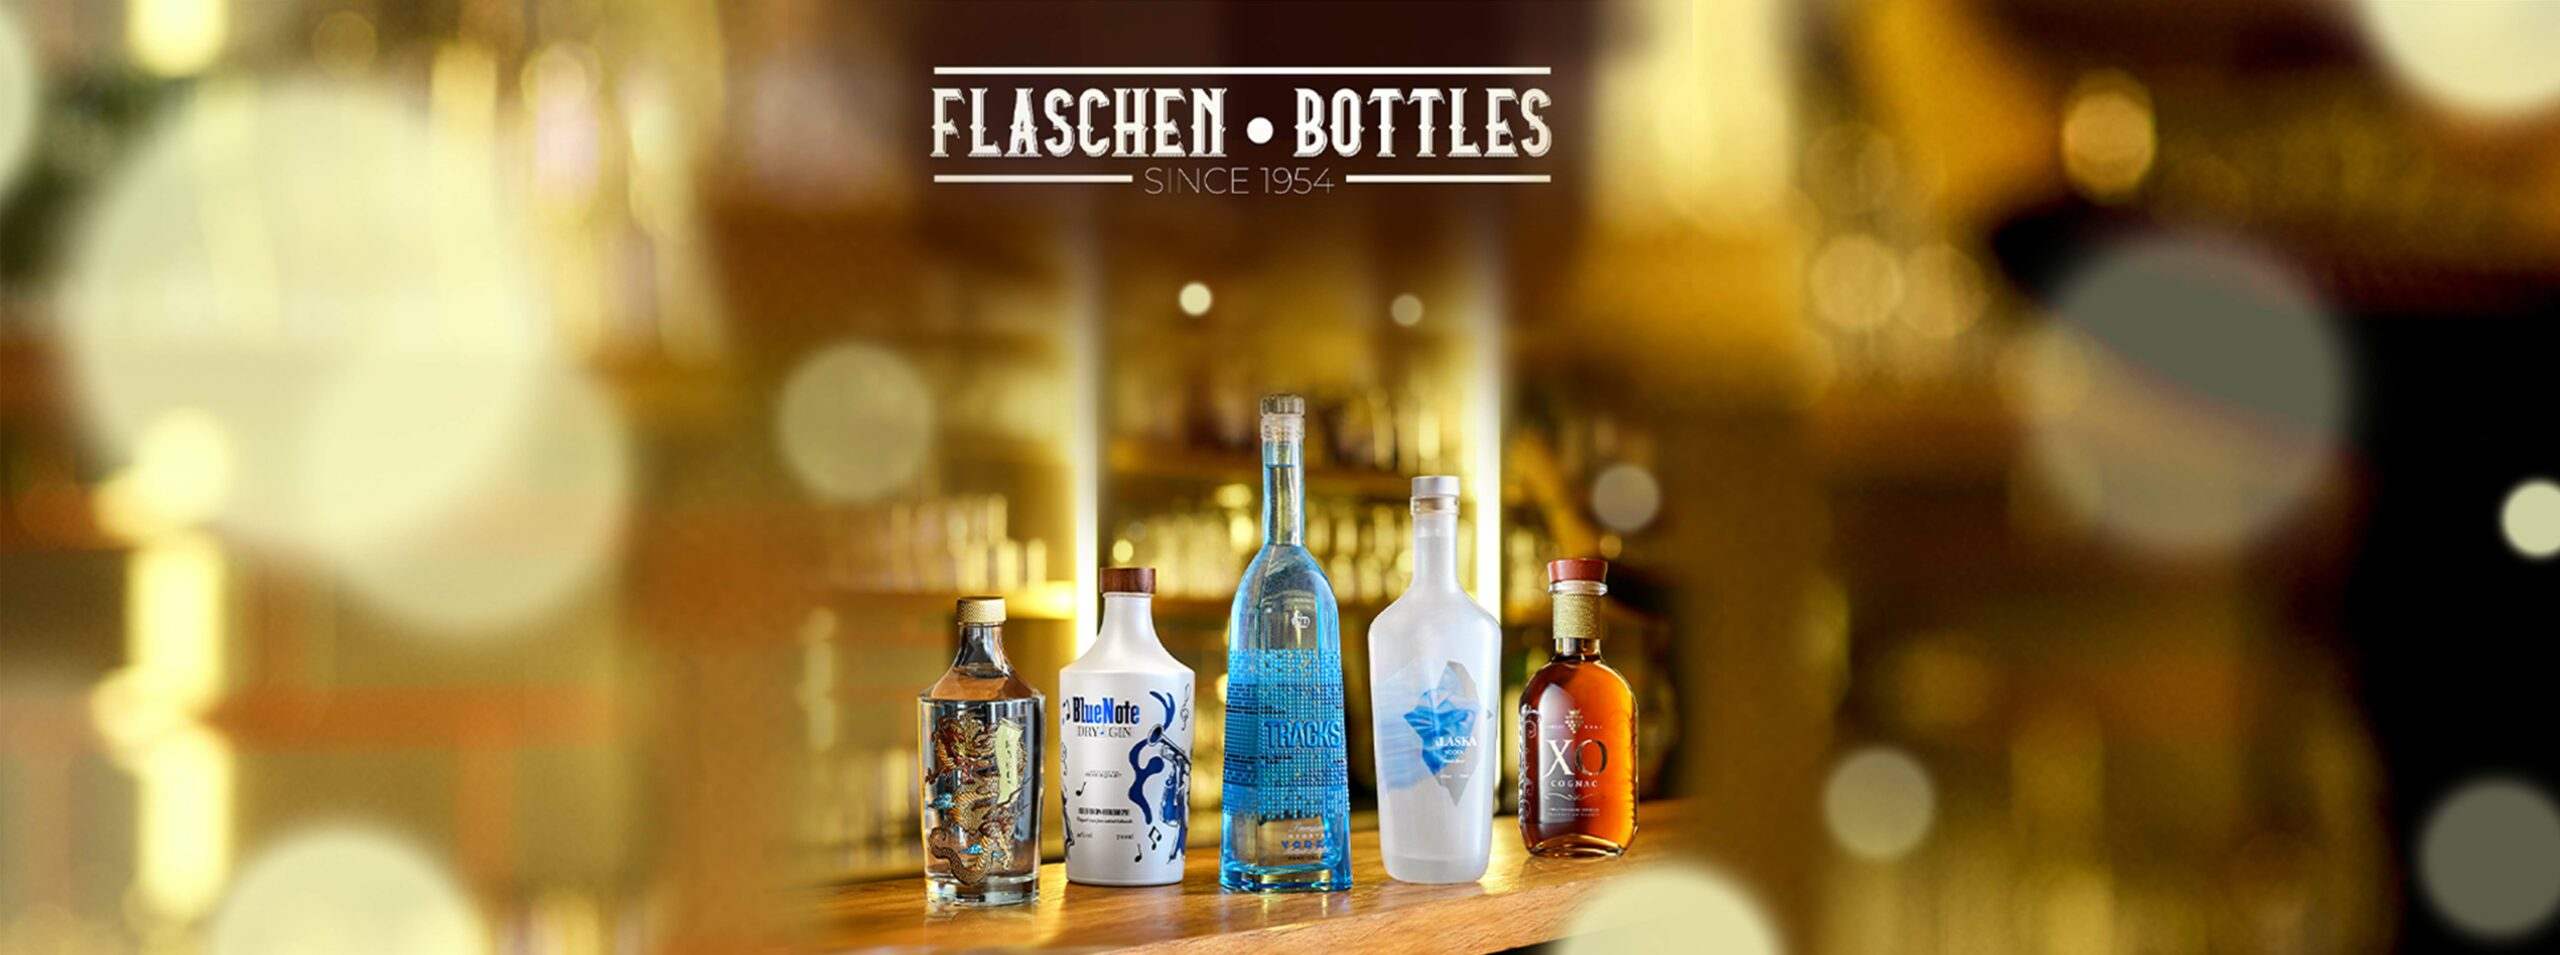 Flaschen, bedruckte Flaschen, Flaschen bedrucken, Trinkgefäße